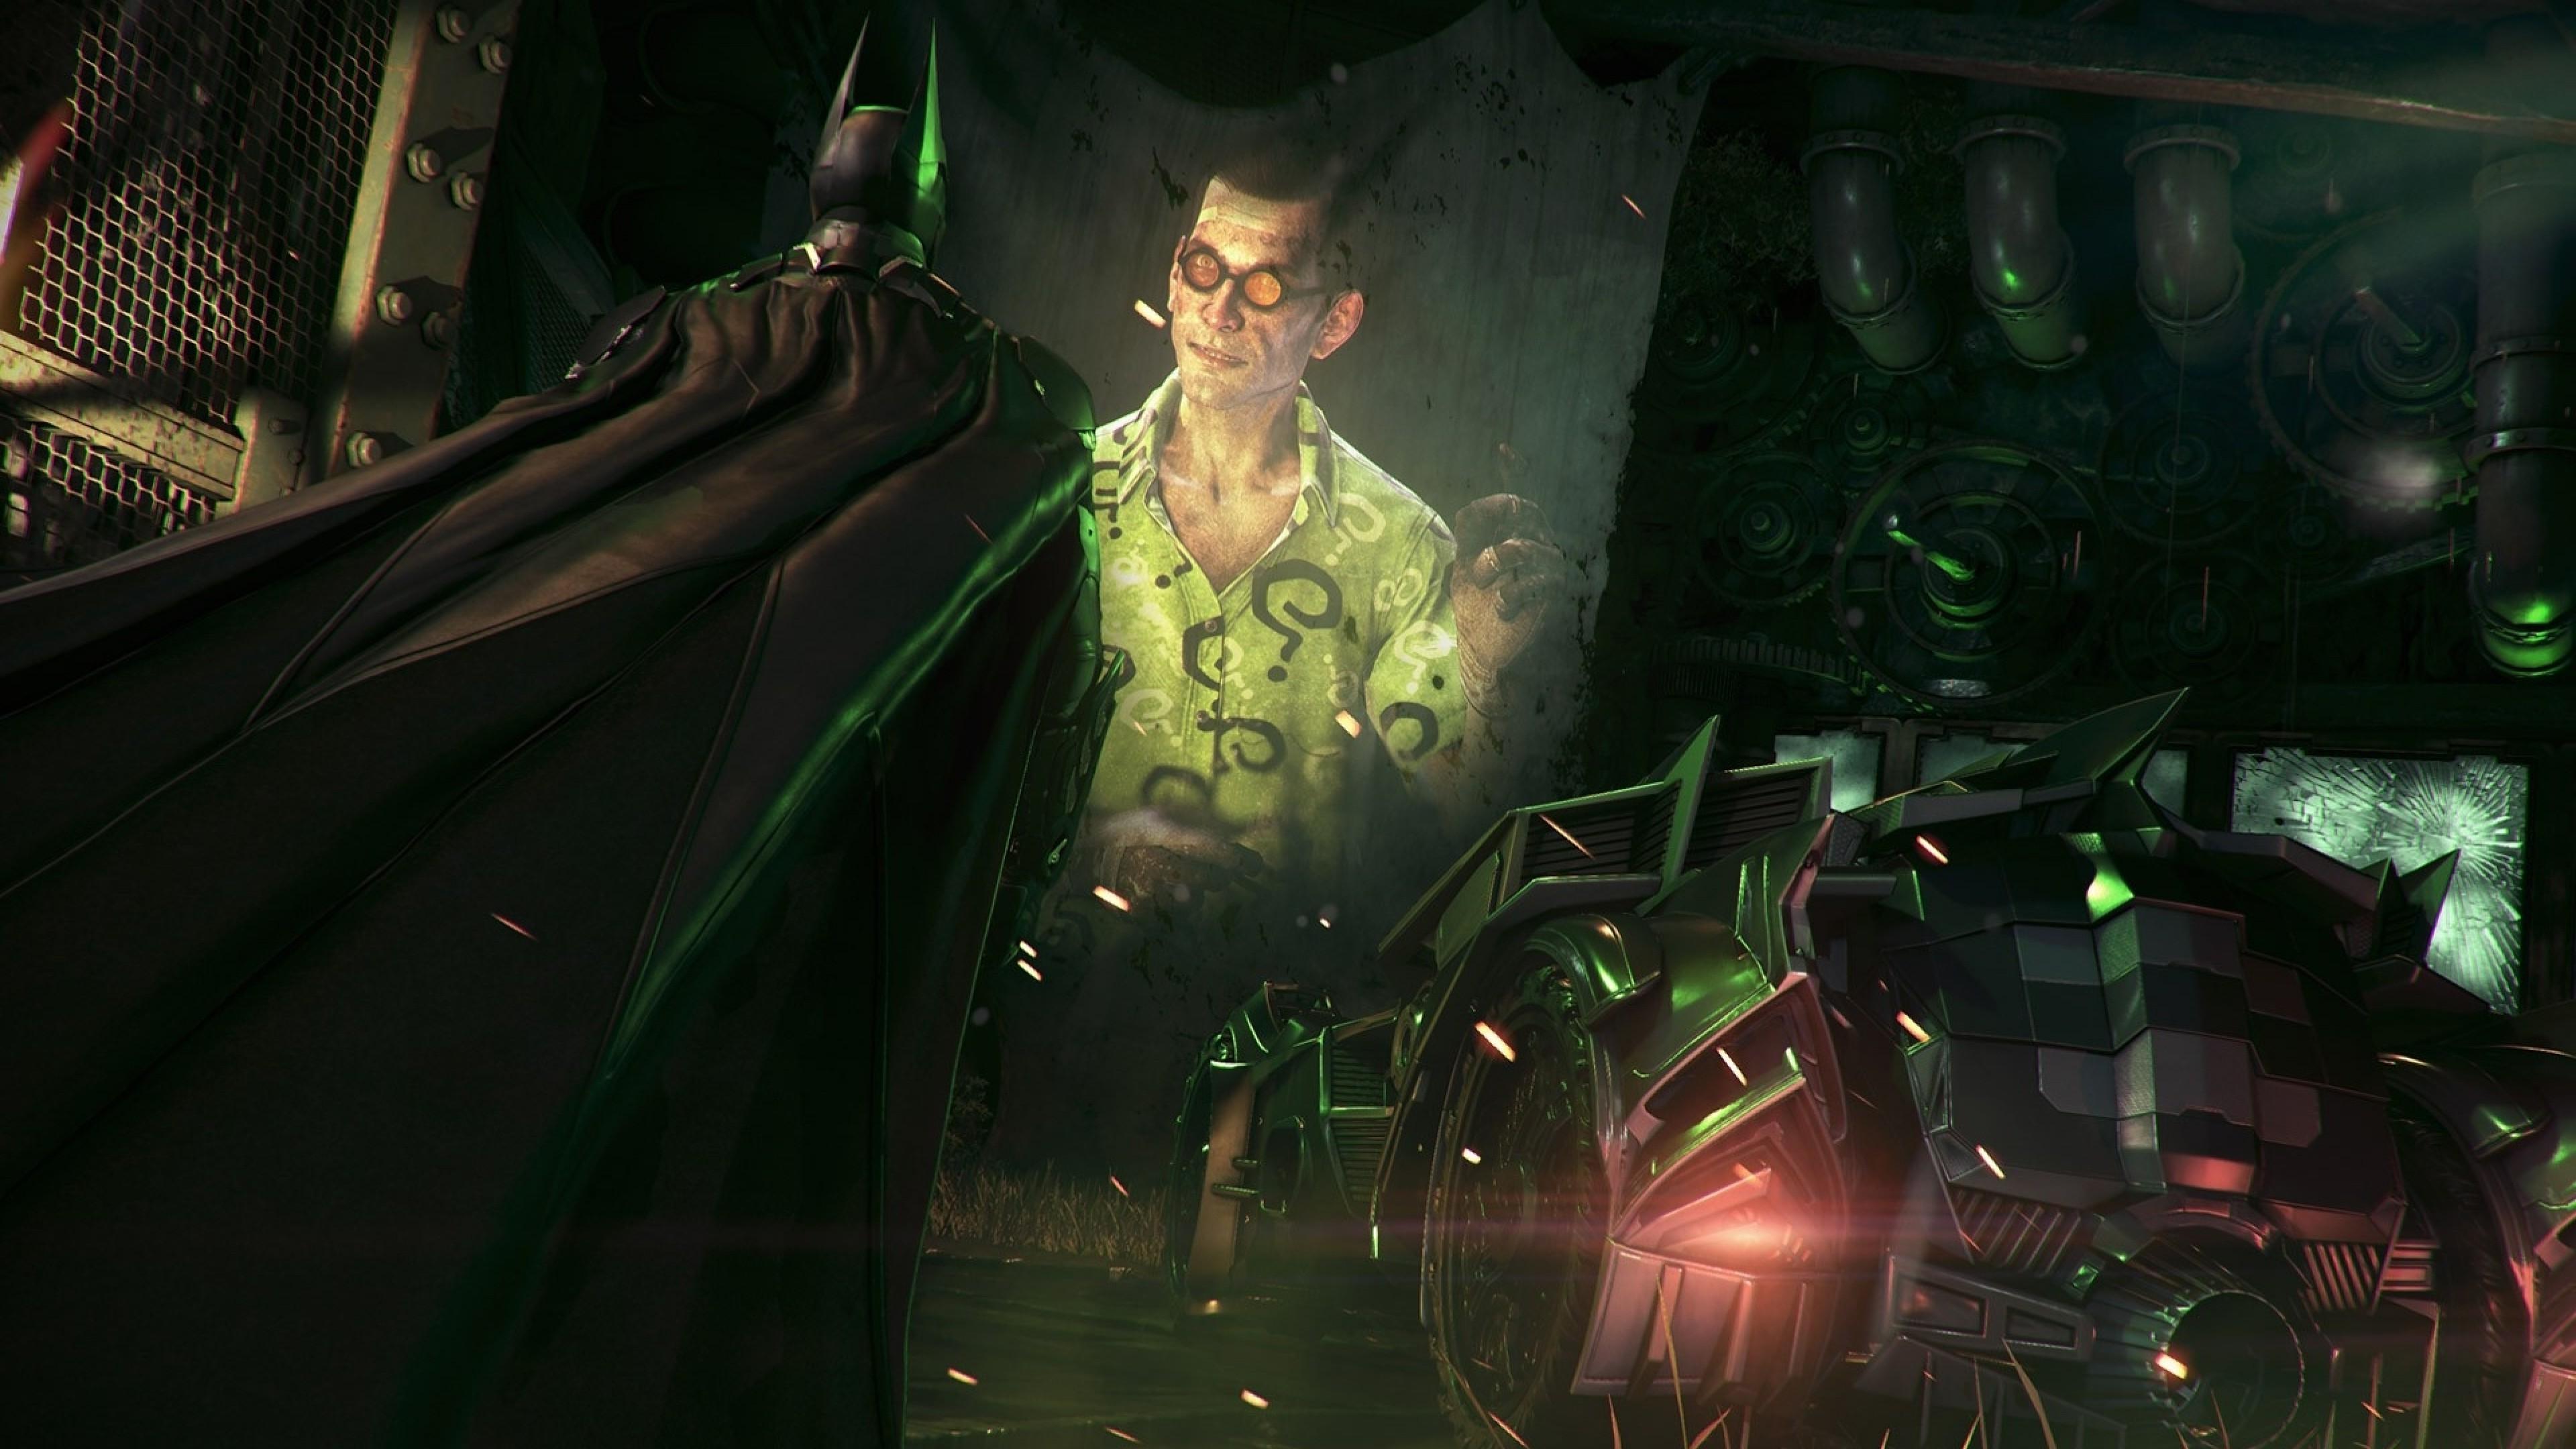 Batman: Arkham Knight, Rocksteady Studios, Batman, Batmobile, Gotham City,  Video Games, The Riddler Wallpapers HD / Desktop and Mobile Backgrounds